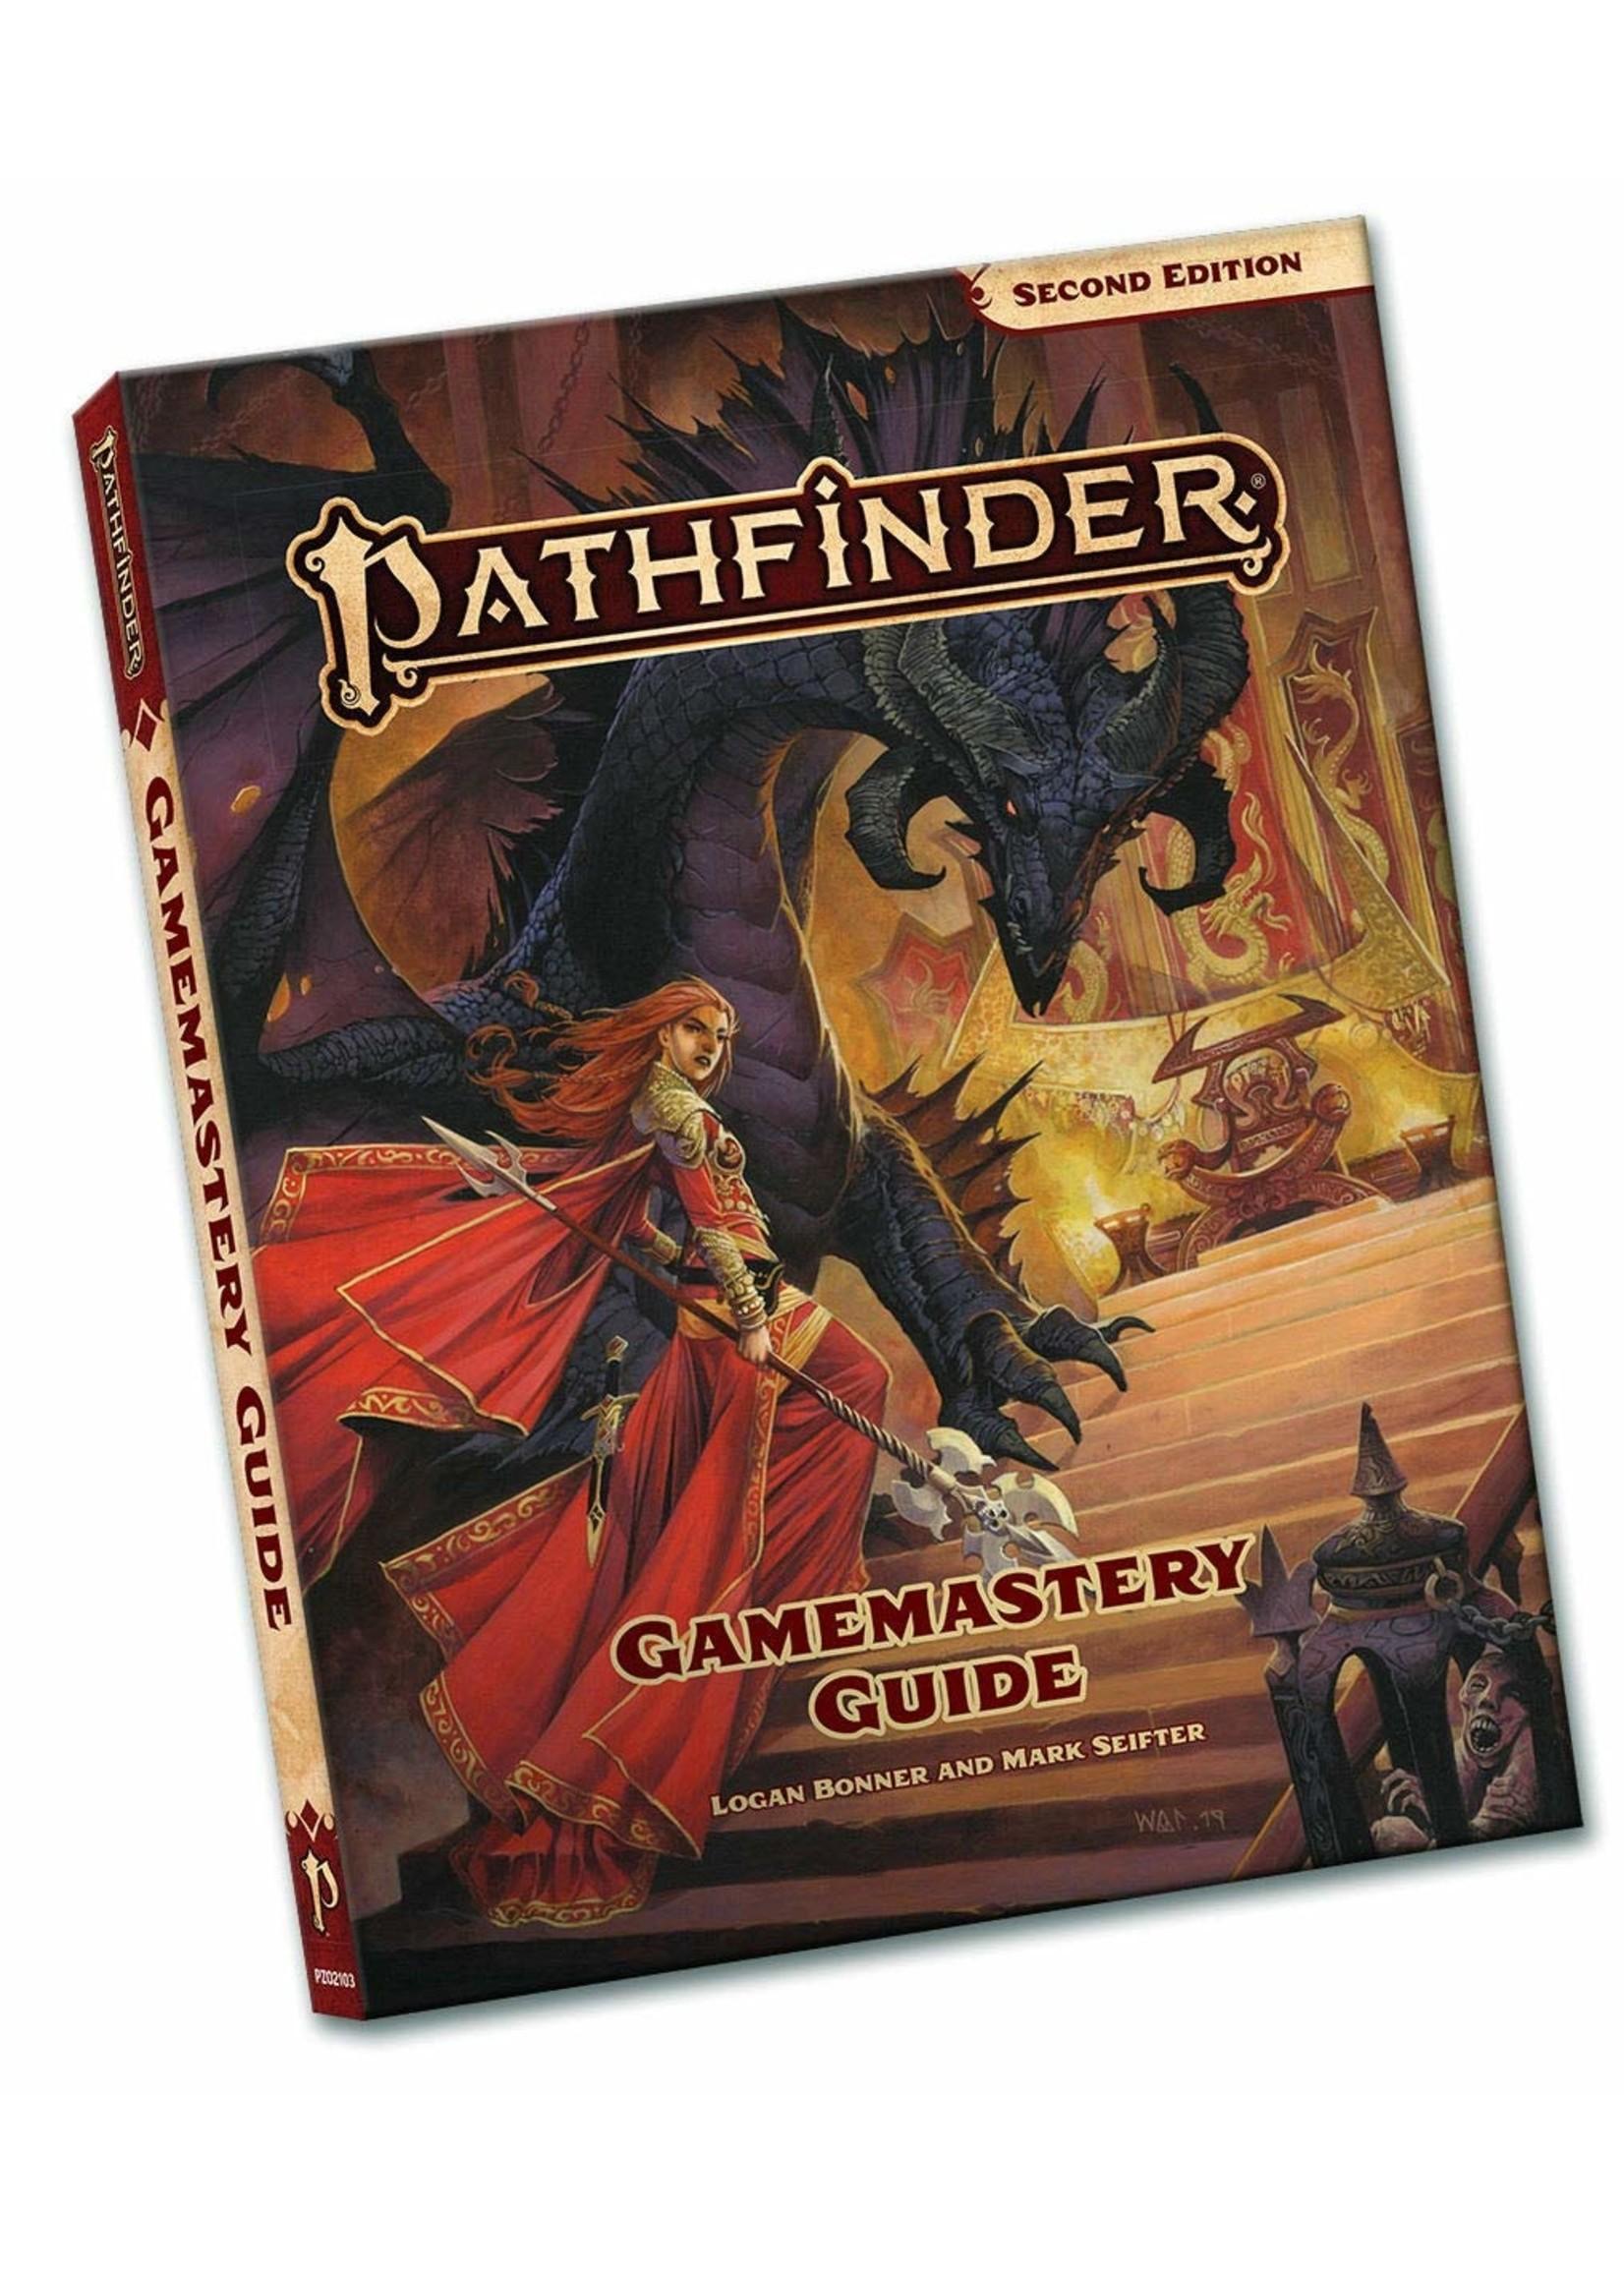 Pathfinder RPG: Gamemastery Guide (Pocket Edition) (P2)